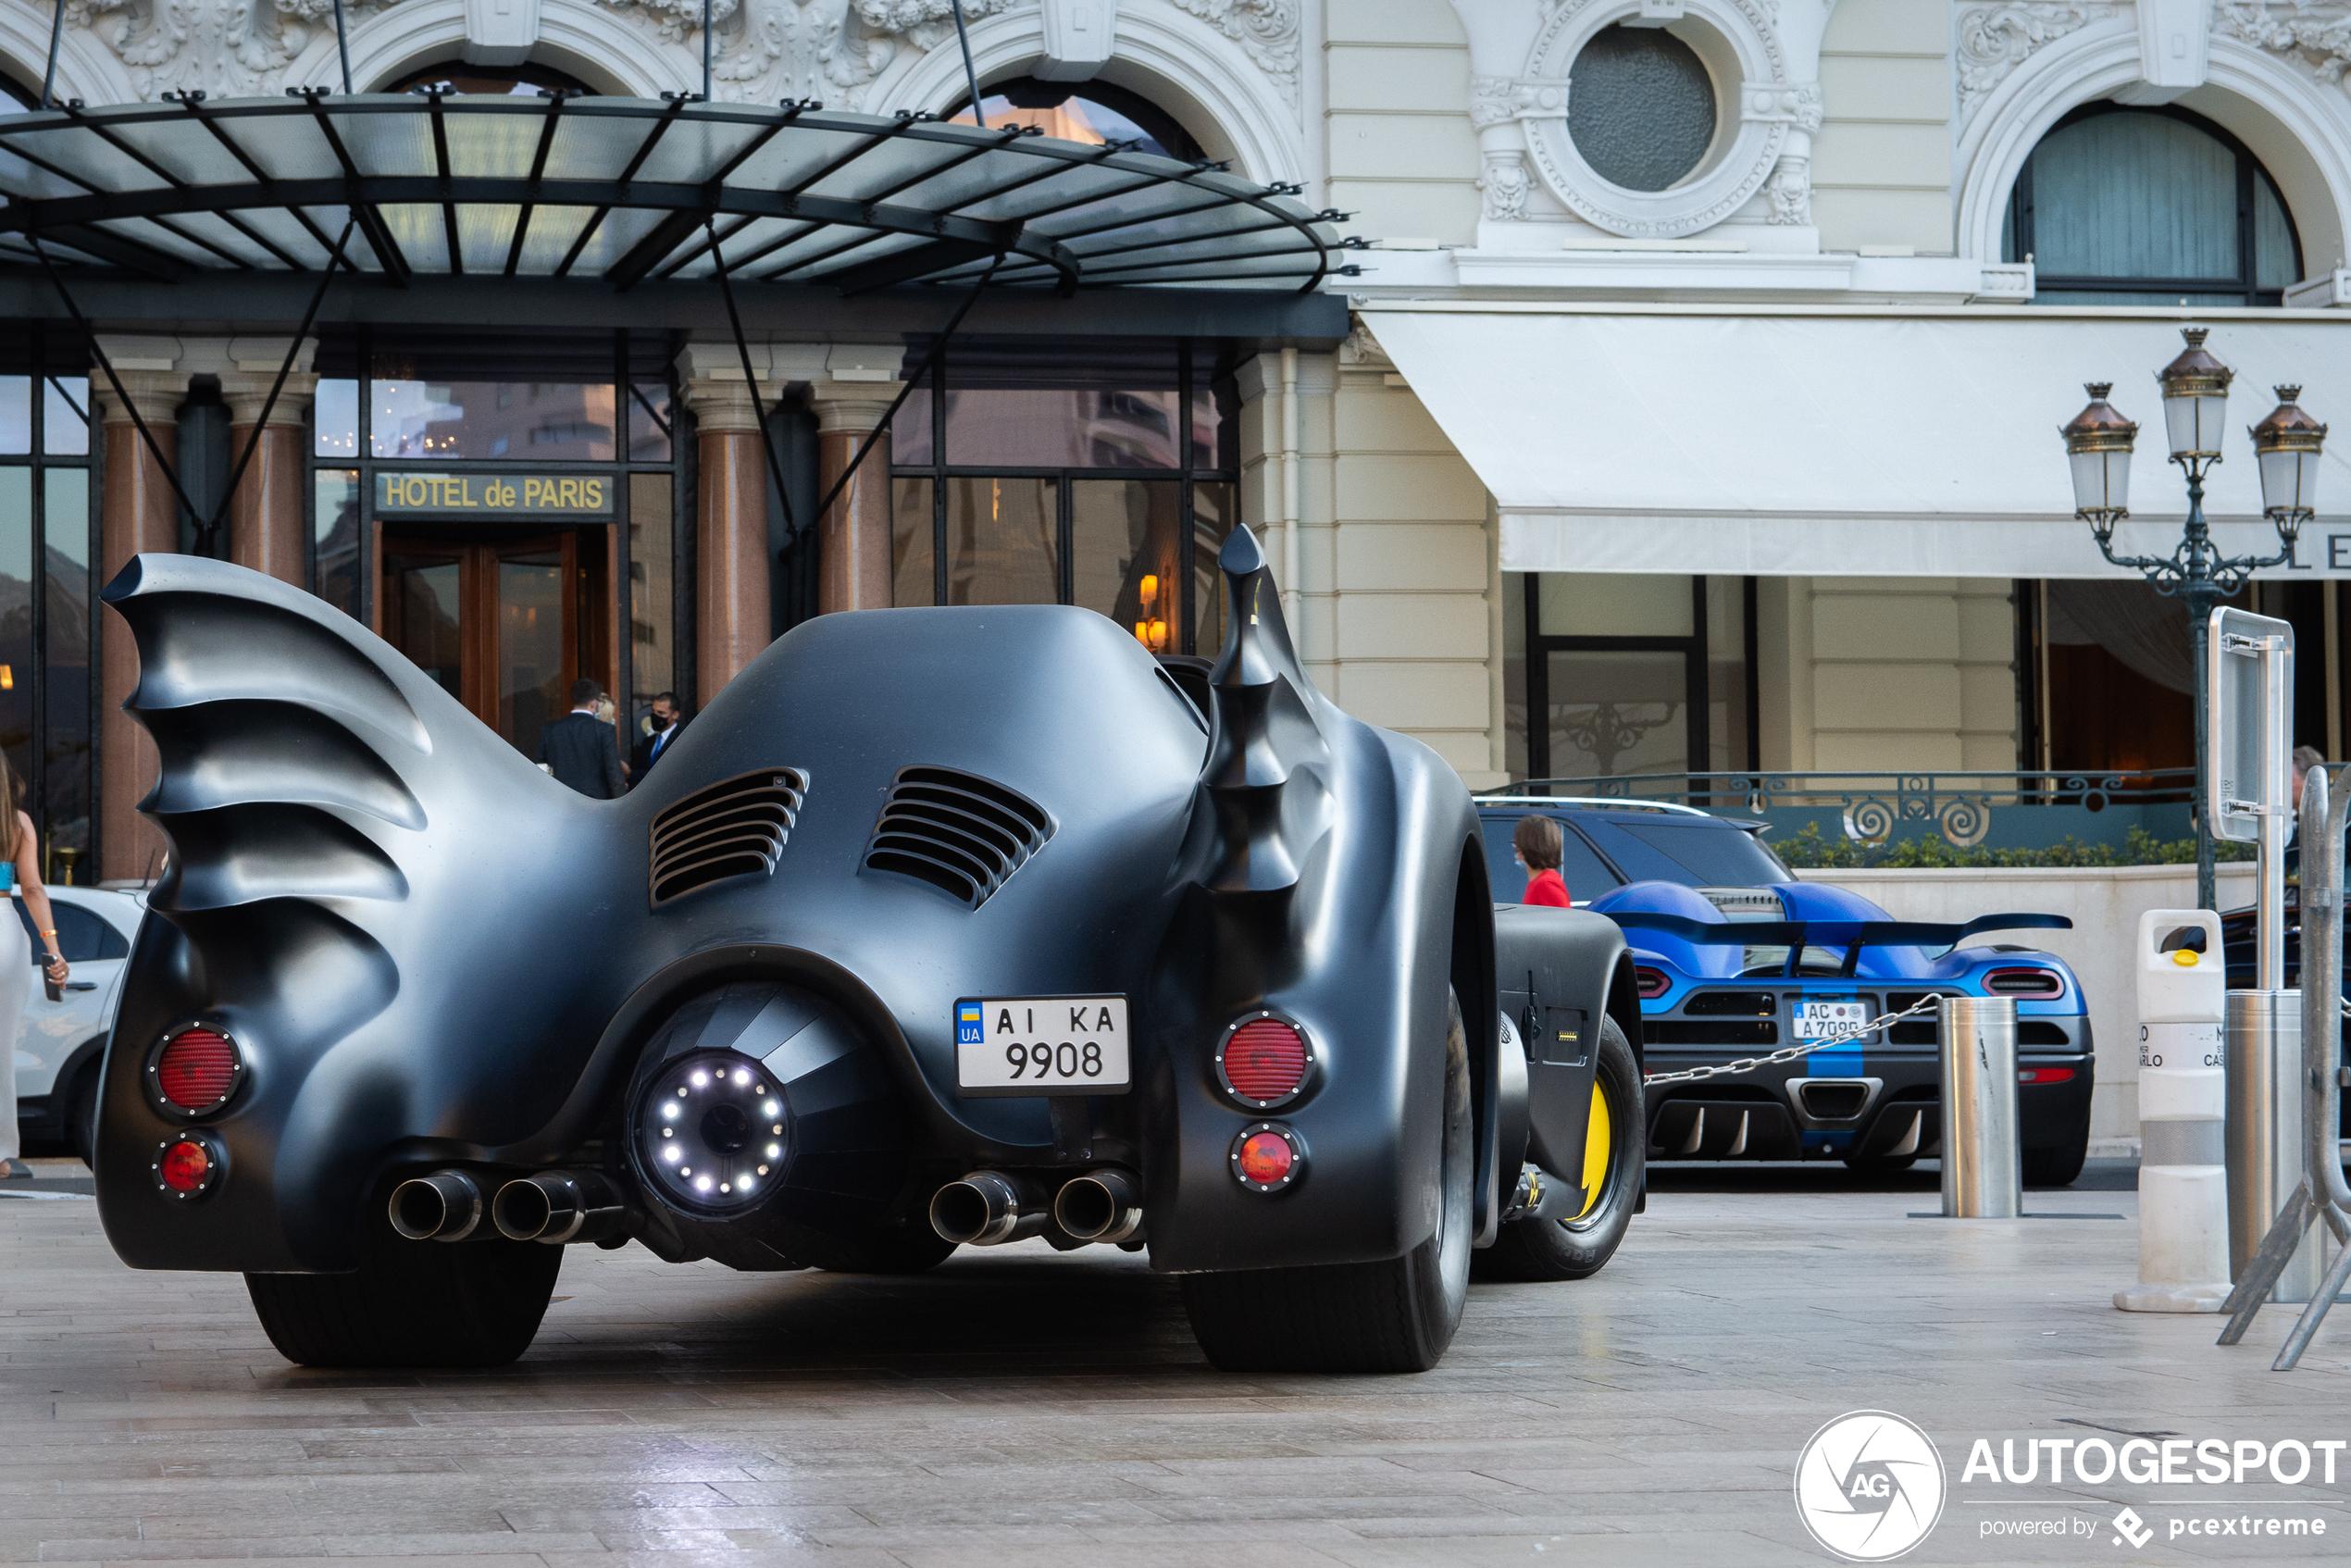 Batman loves Monaco too